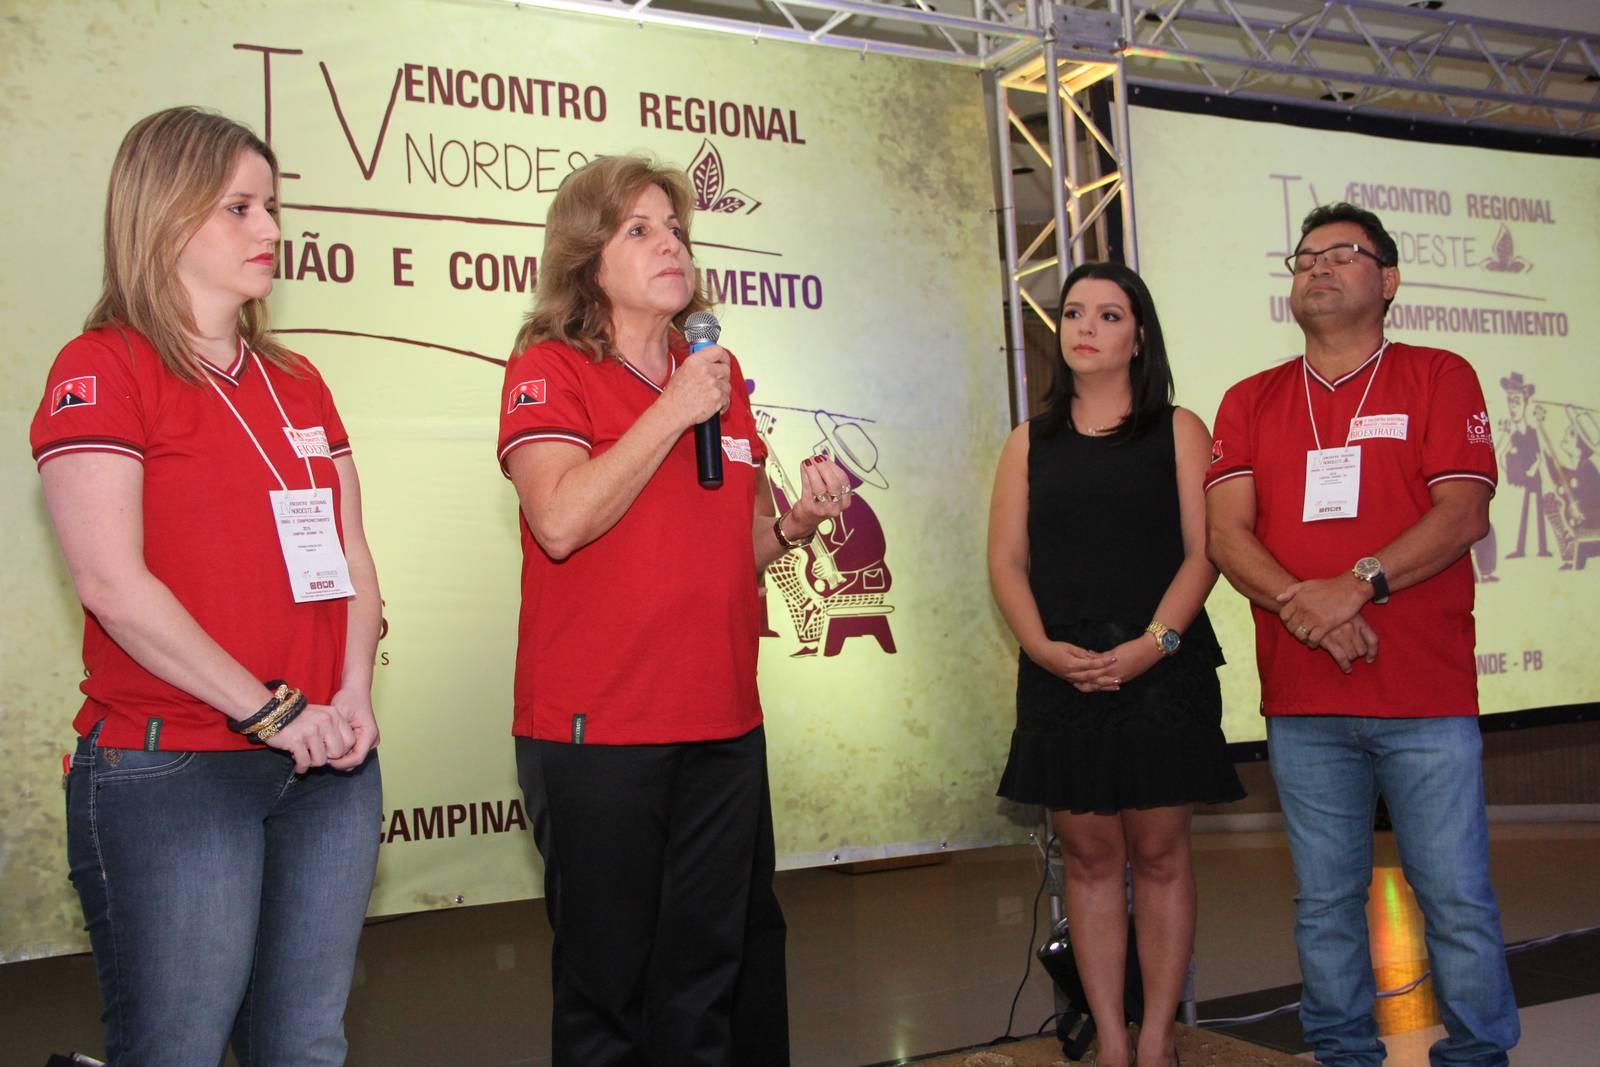 IV Encontro Regional do Nordeste - Bio Extratus (68)